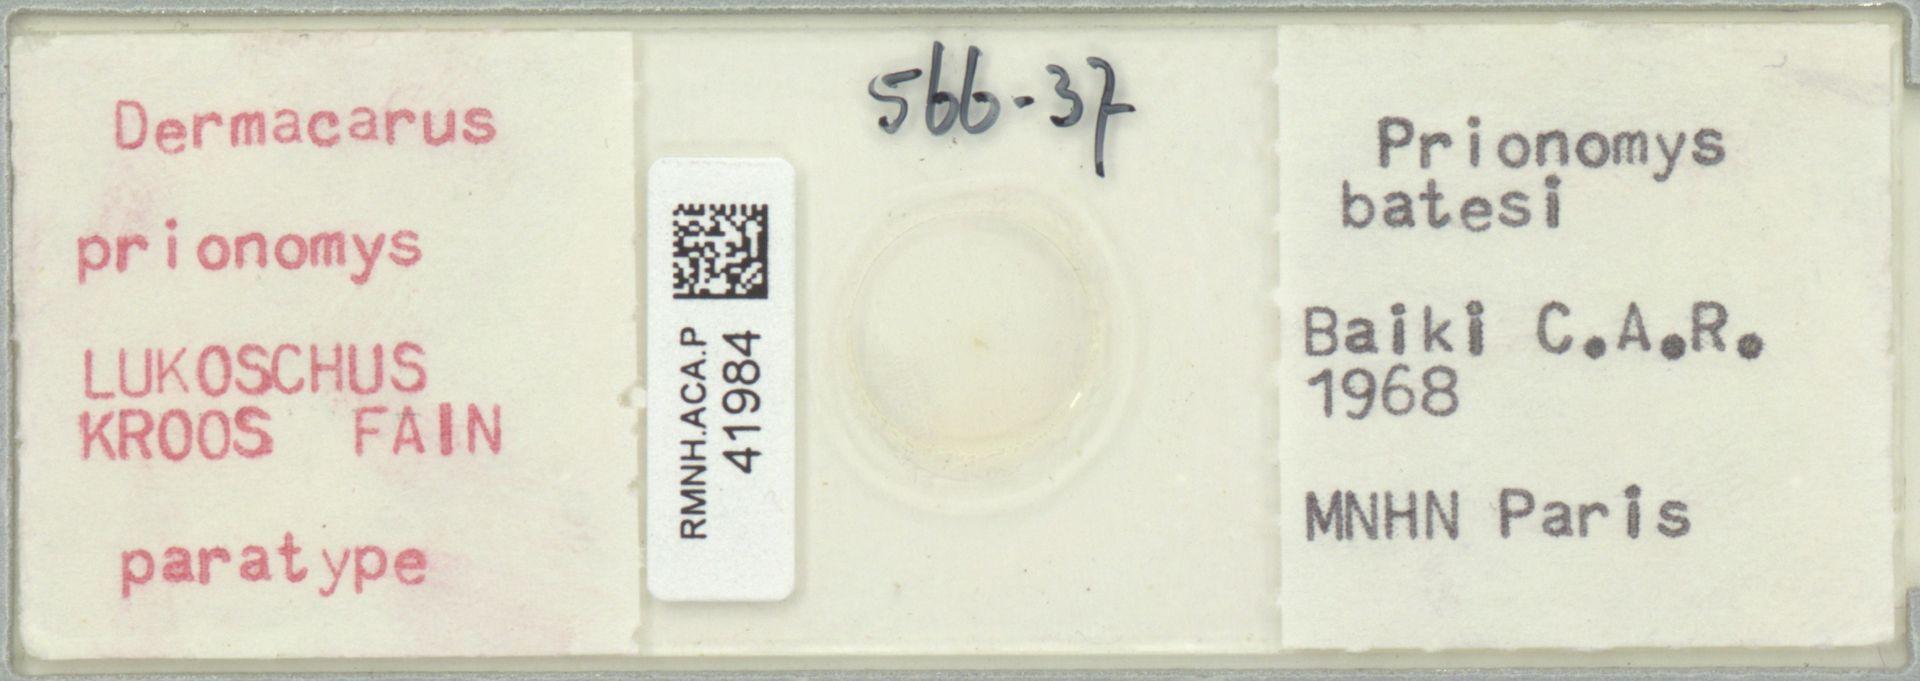 RMNH.ACA.P.41984 | Dermacarus prionomys Lukoschus Kroos Fain